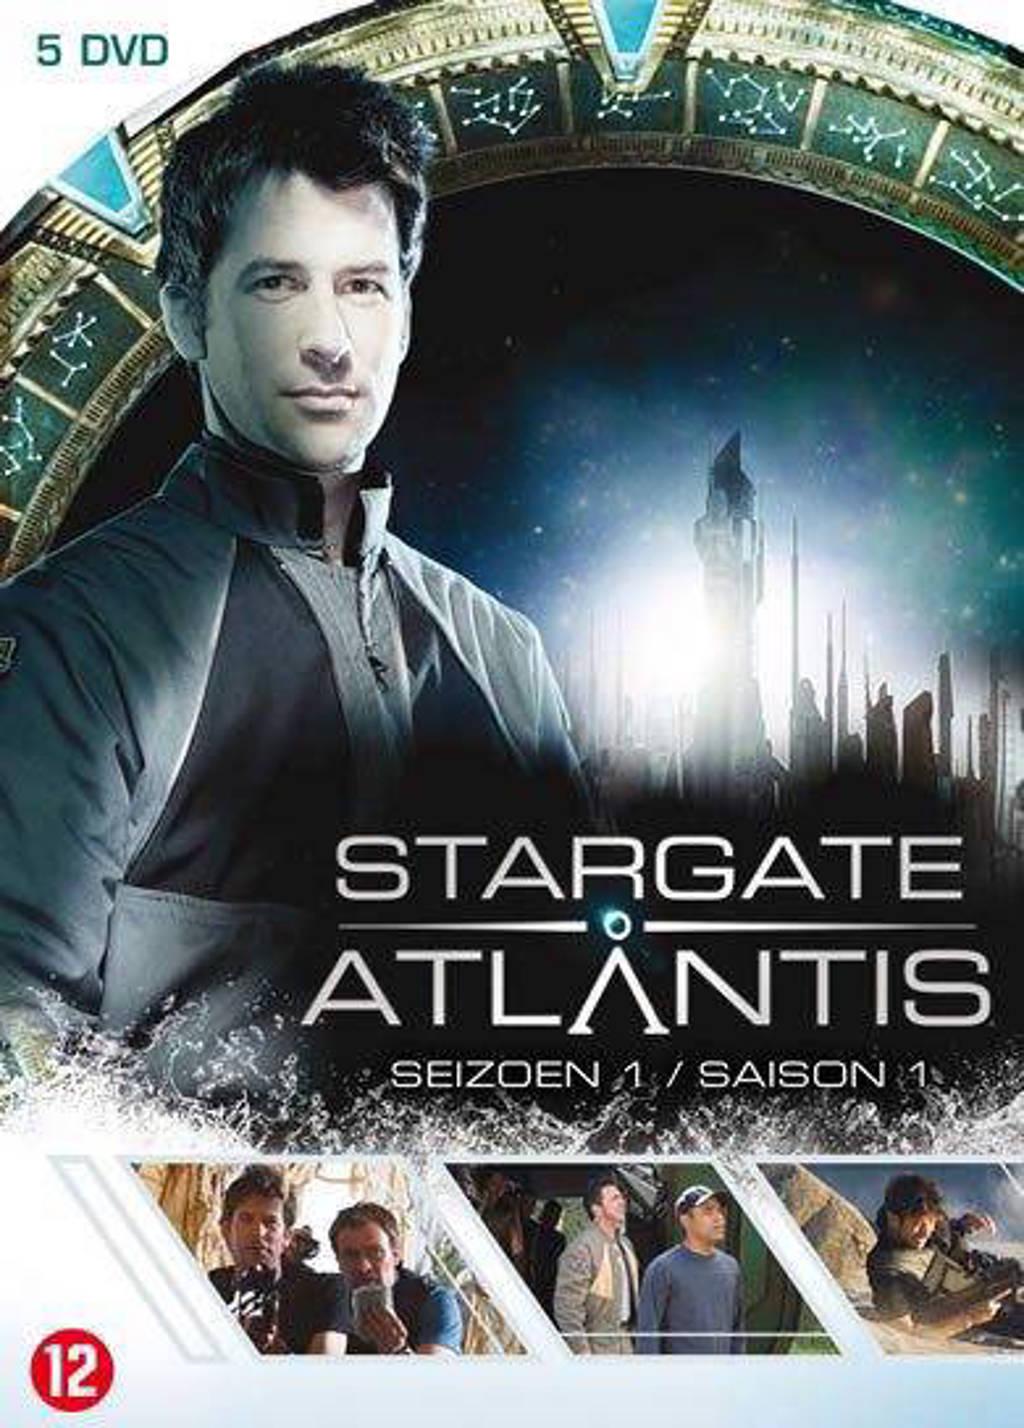 Stargate Atlantis - Seizoen 1 (DVD)